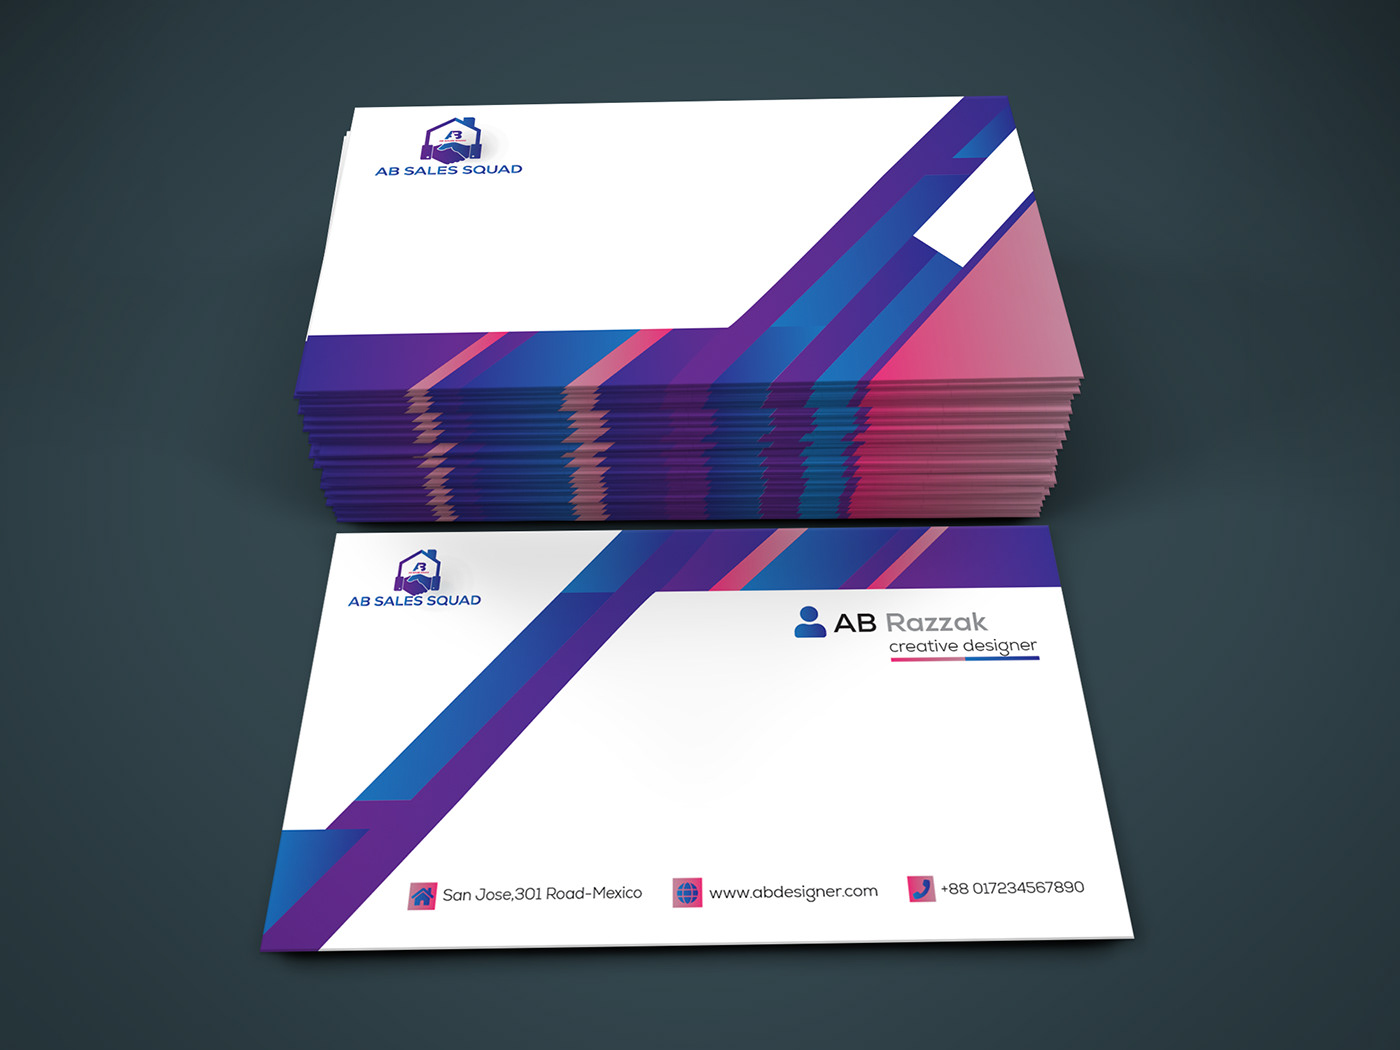 Business card design Corporate Business Card Crative Business card logo Name card pink card simple cbusiness card smart business card template visiting card